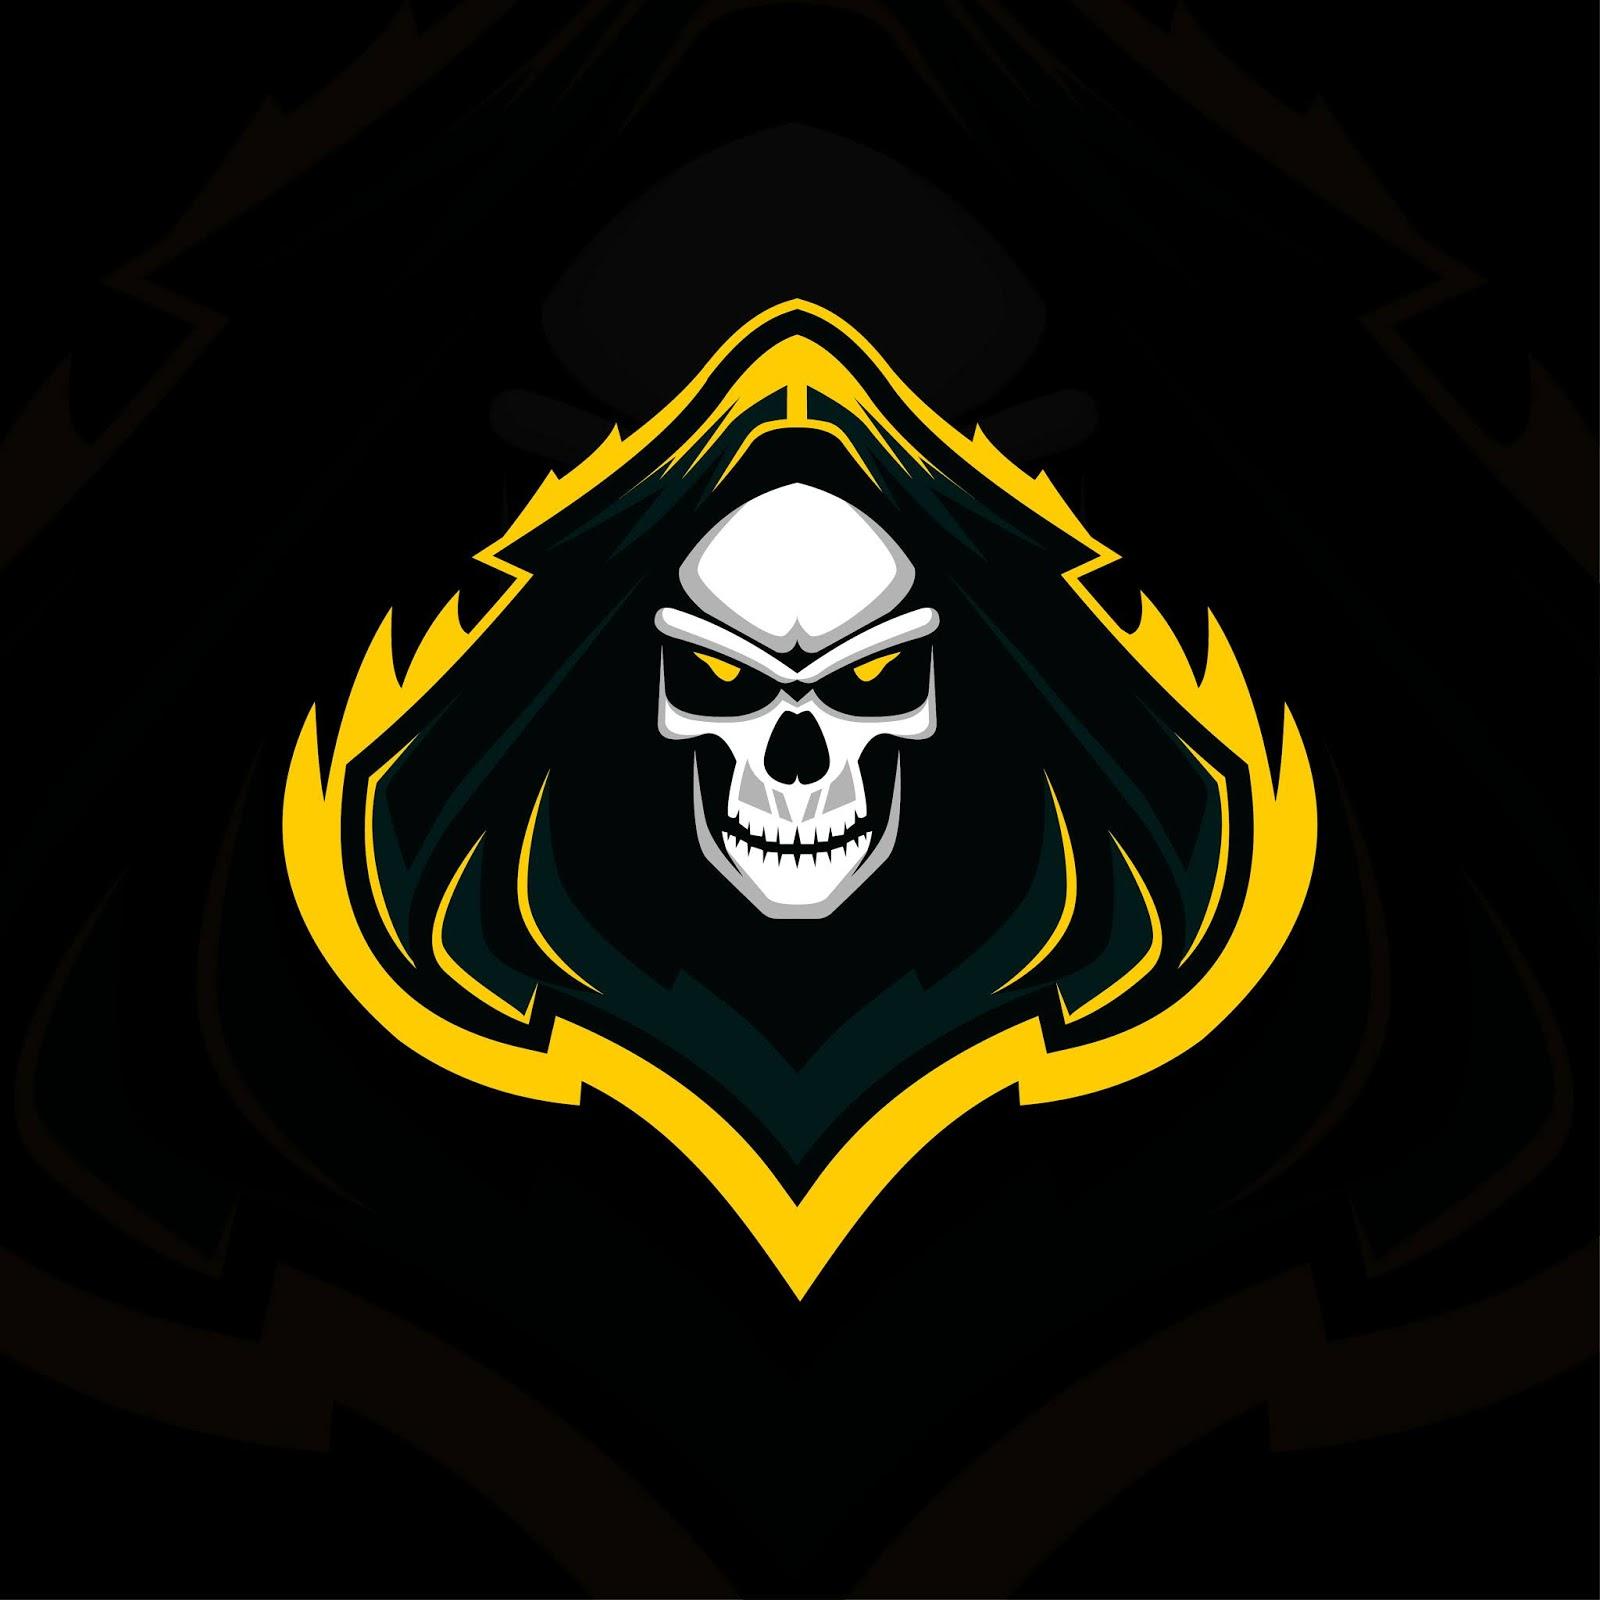 Head Reaper Mascot Logo E Sport Design Free Download Vector CDR, AI, EPS and PNG Formats